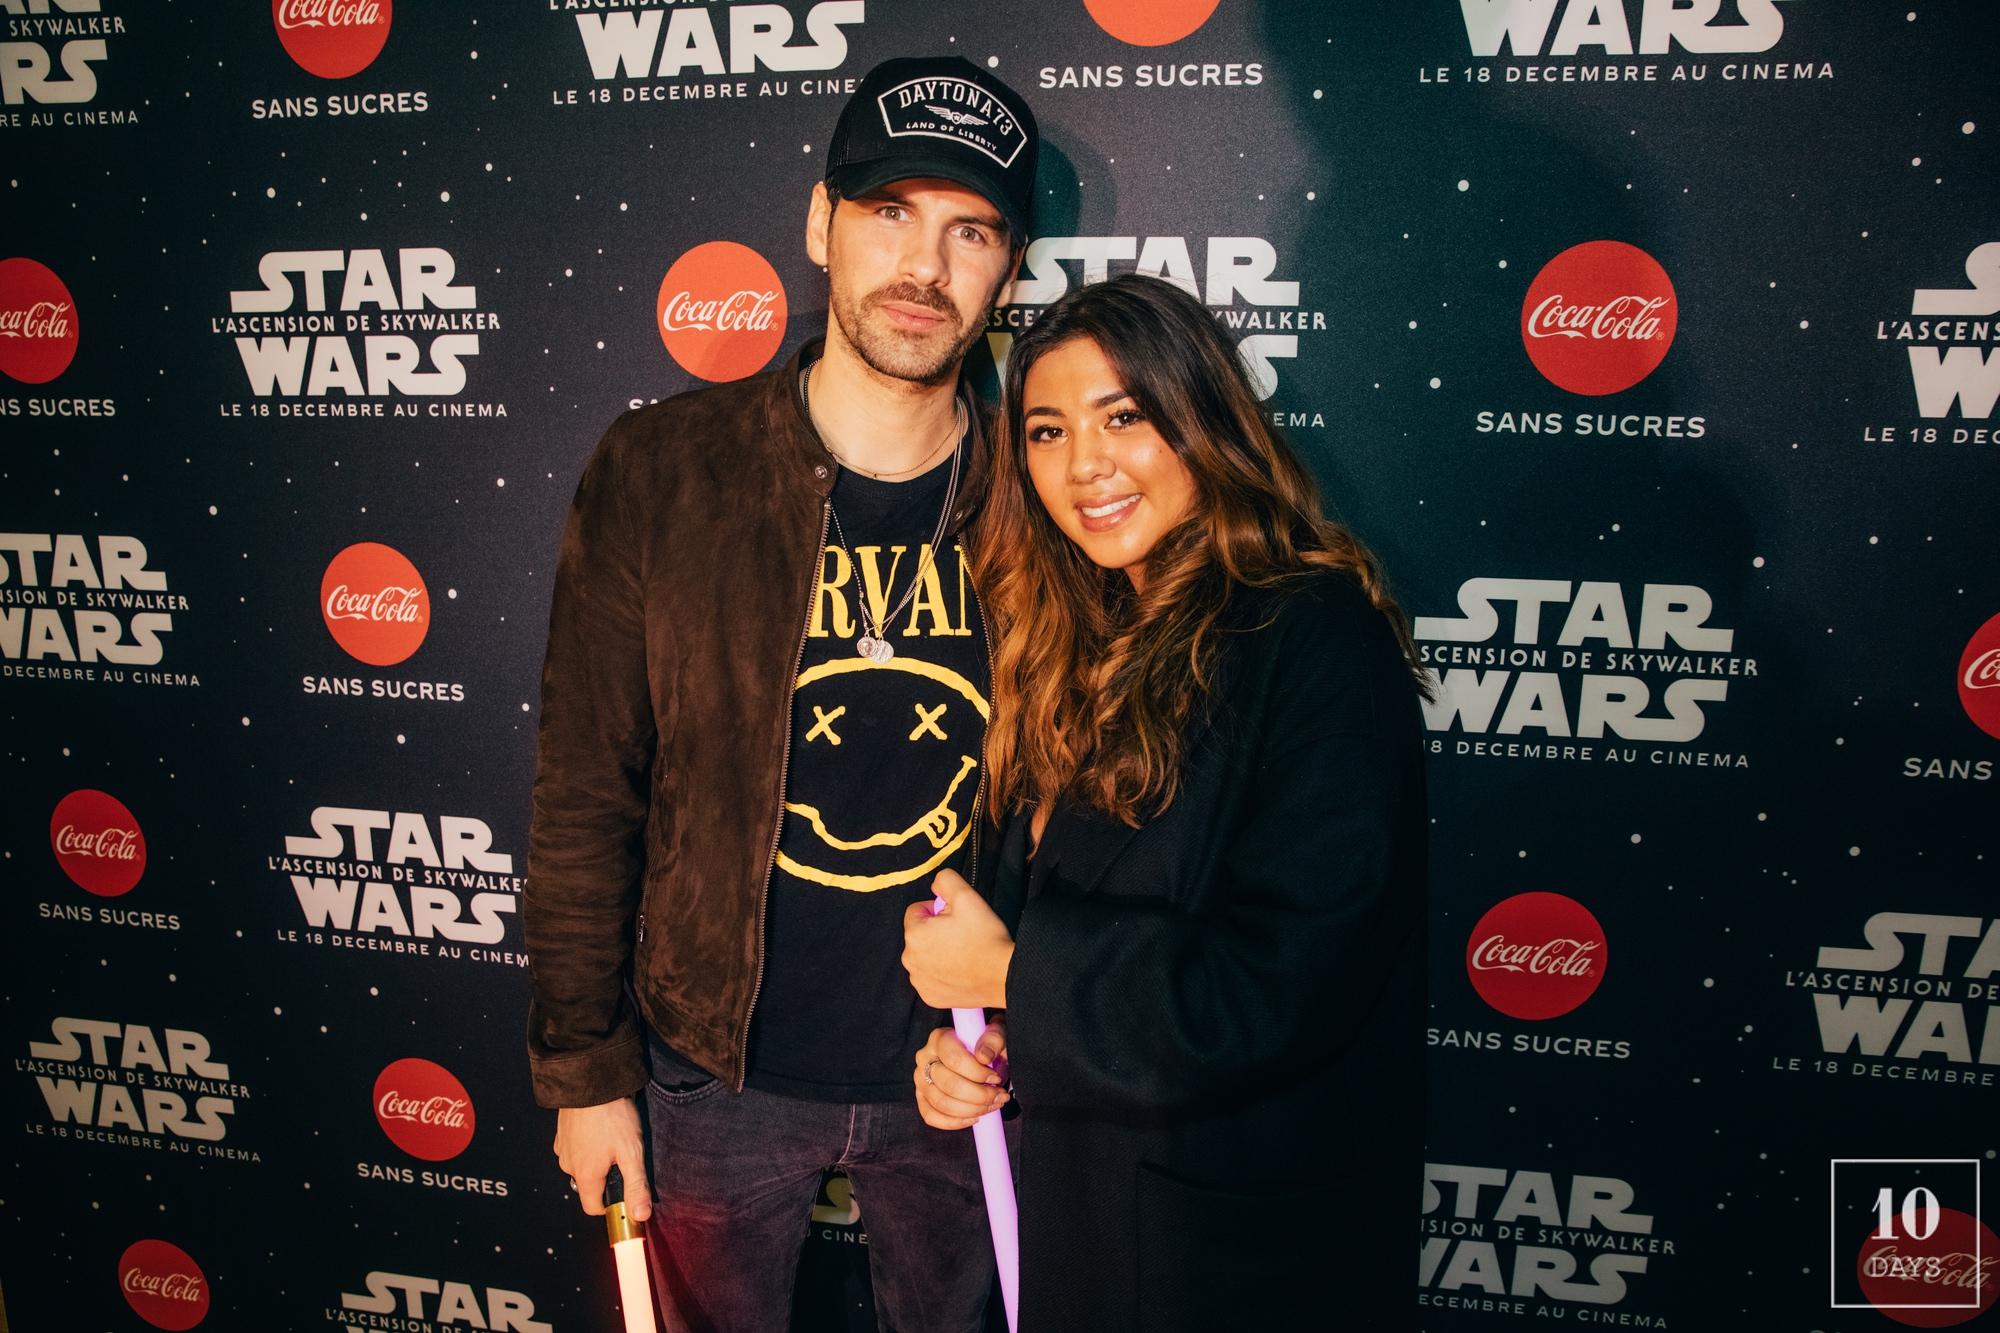 Star Wars Screening by Coca Cola